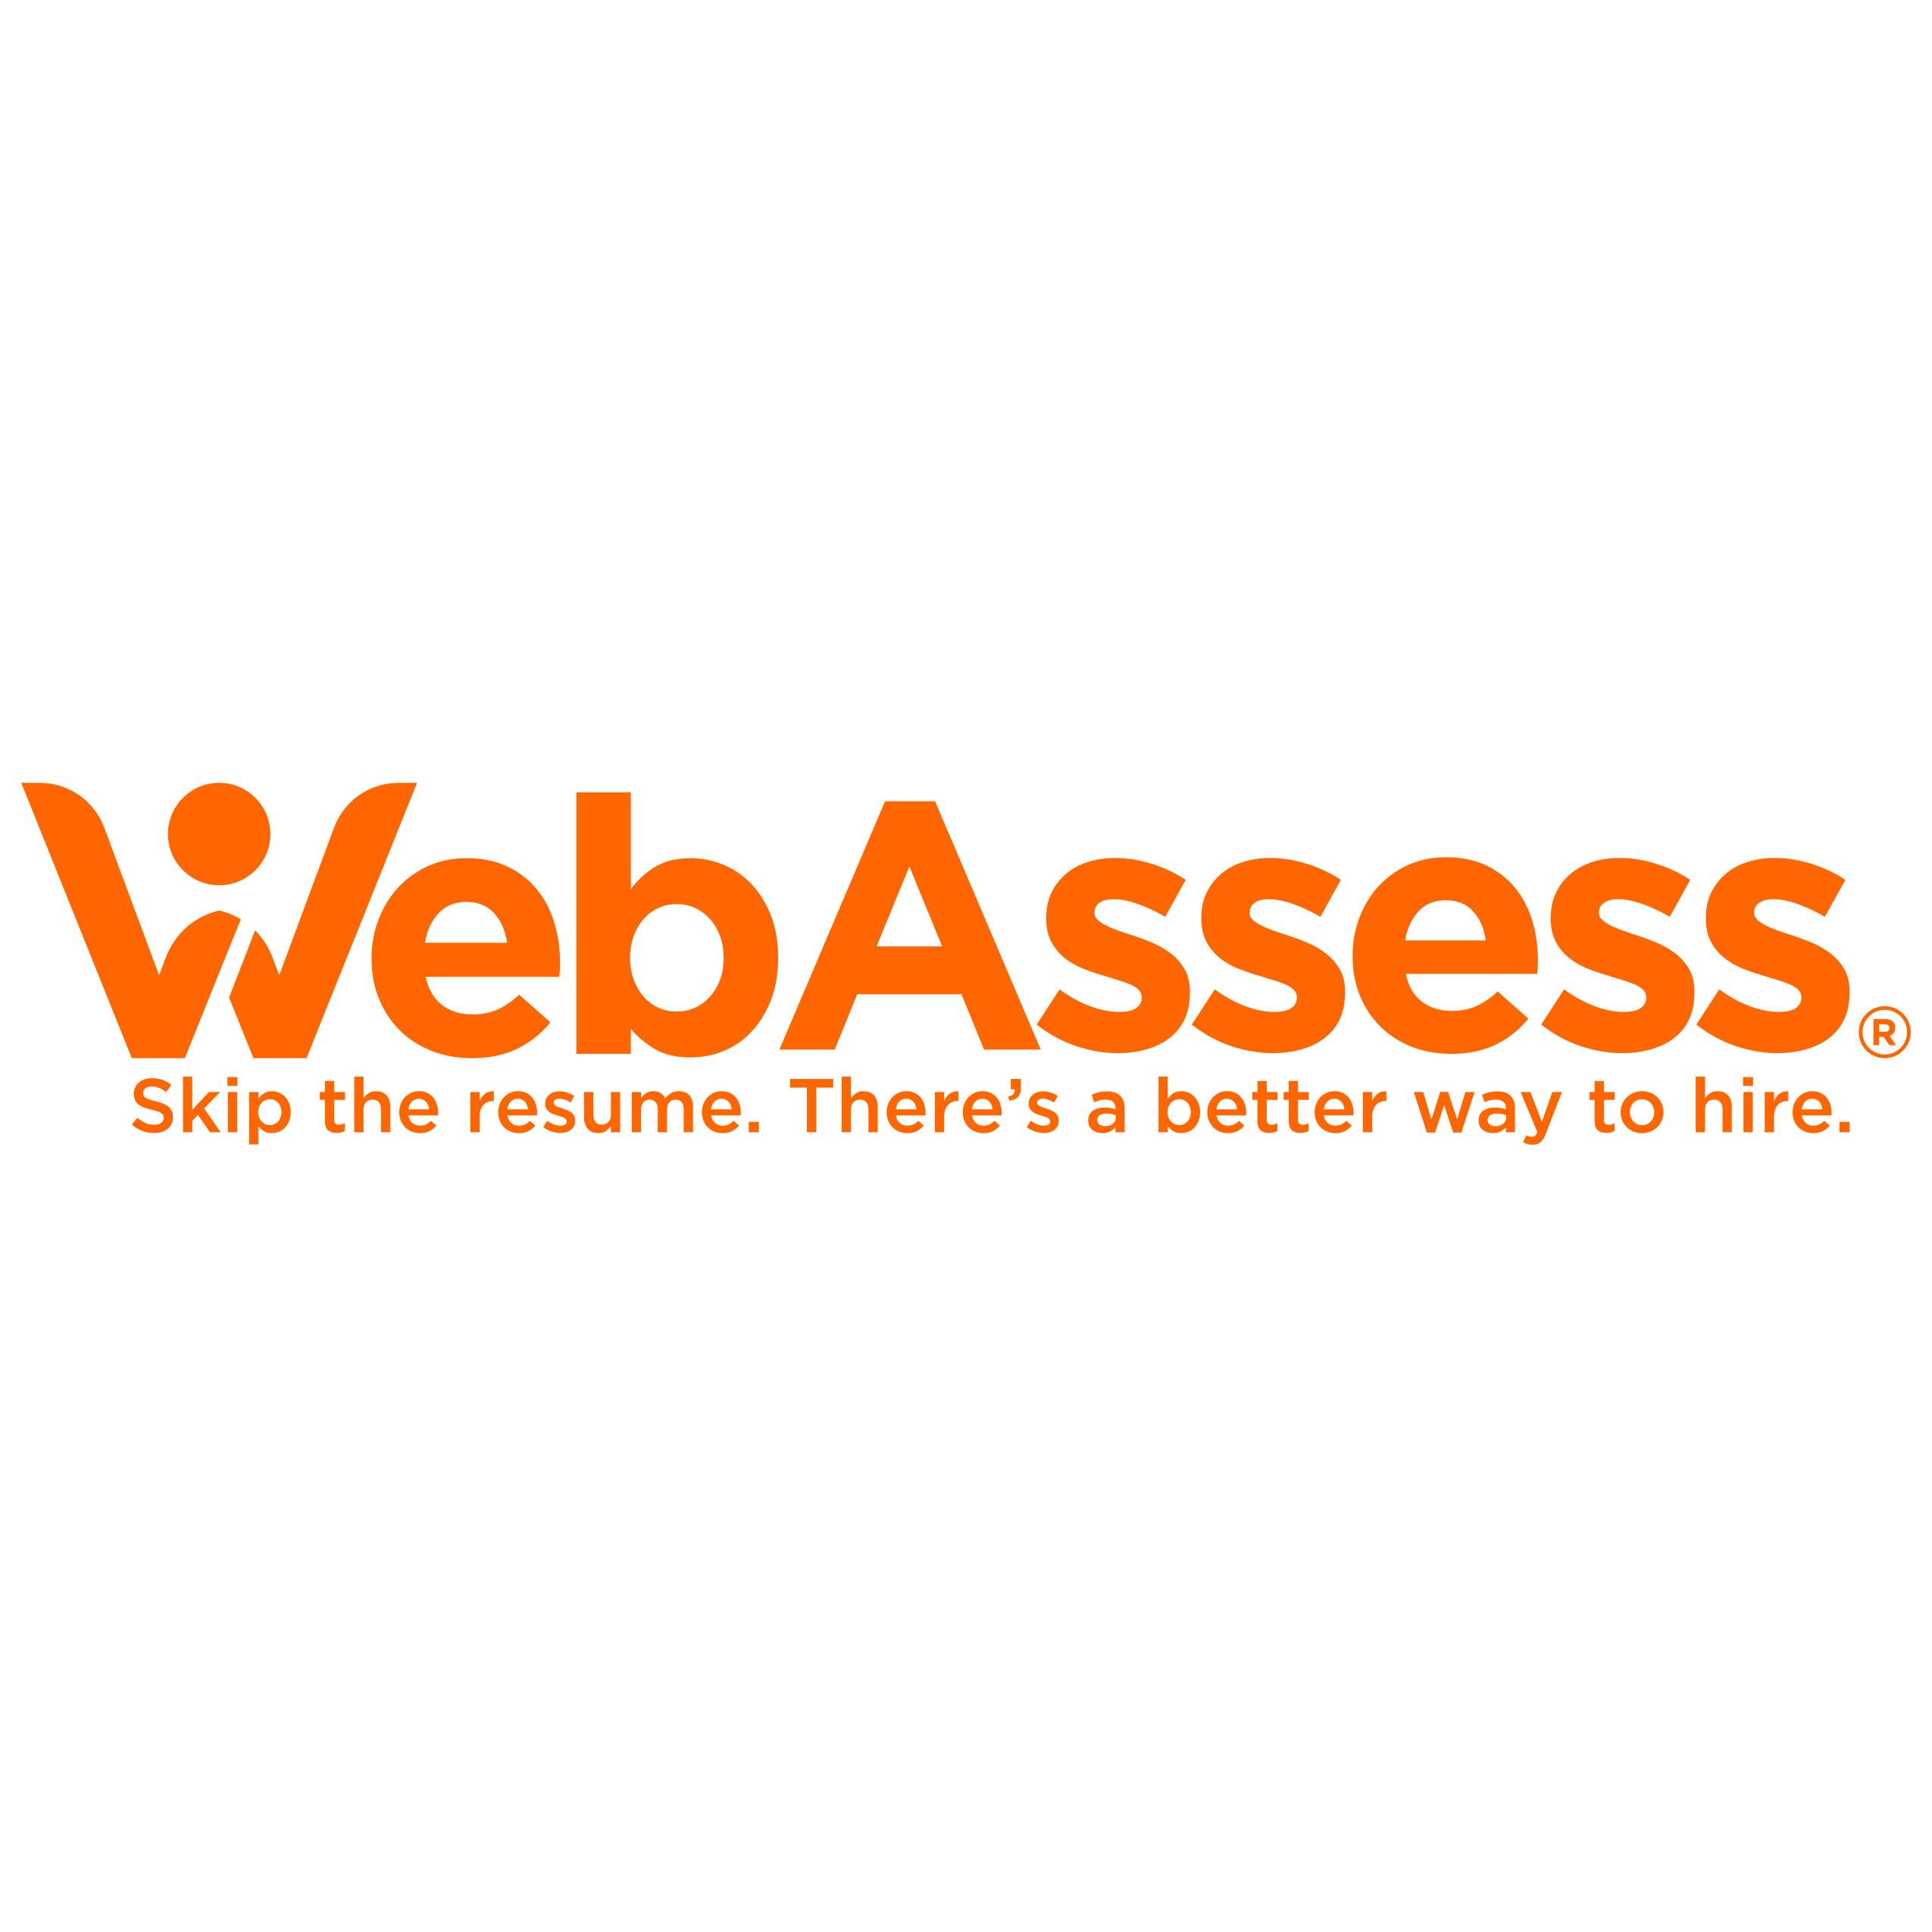 WebAssess Logo, Site Icon, Social Media Banners